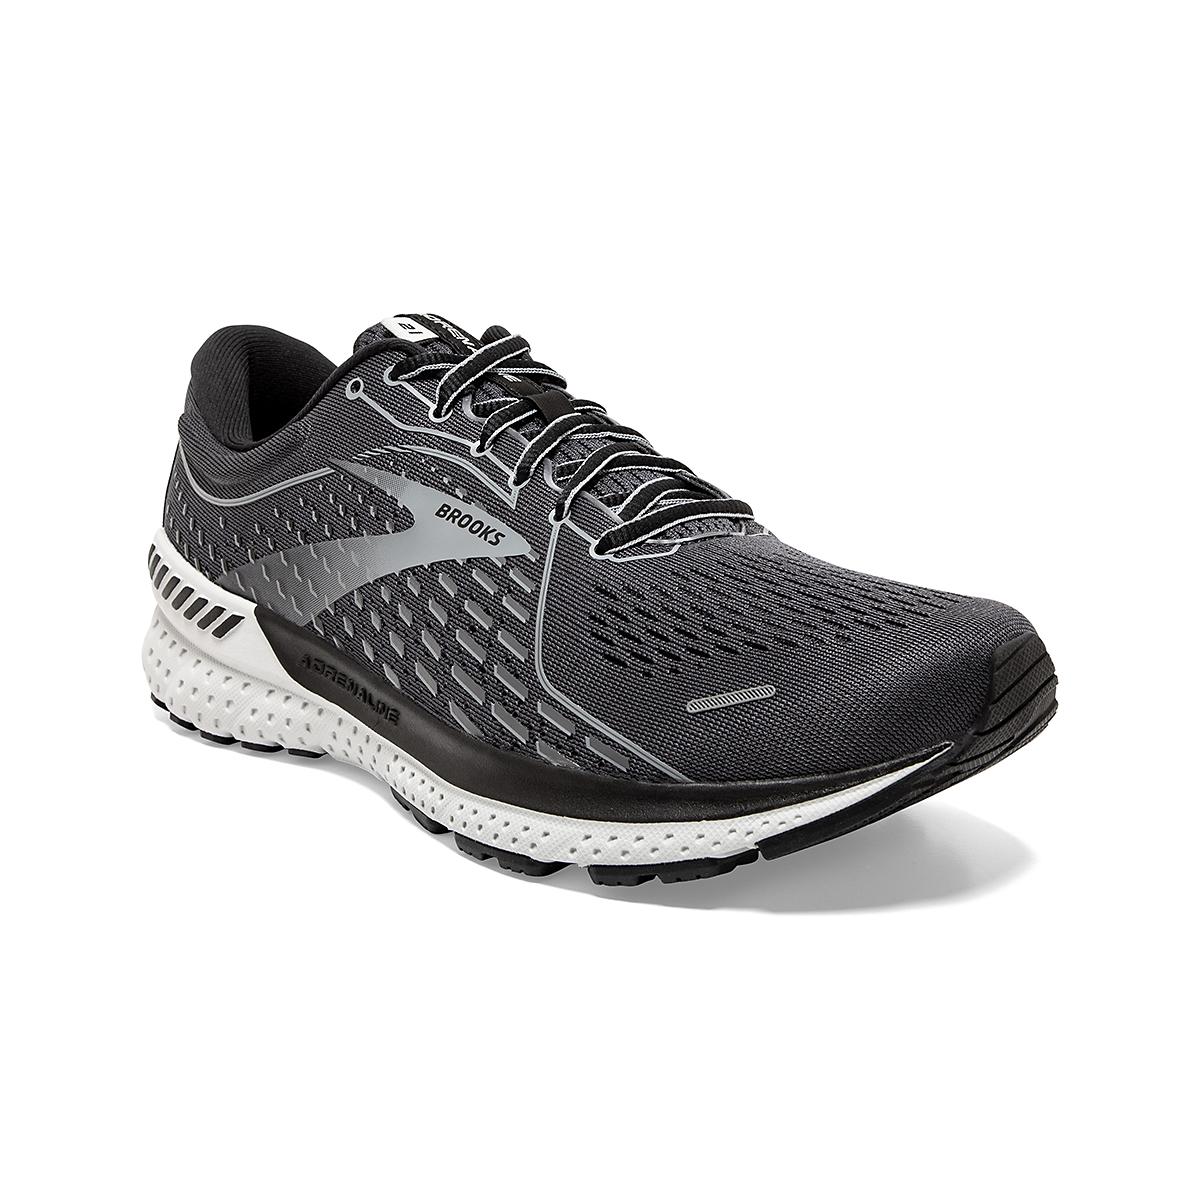 Men's Brooks Adrenaline GTS 21 Running Shoe - Color: Blackened Pearl - Size: 7 - Width: Regular, Blackened Pearl, large, image 3